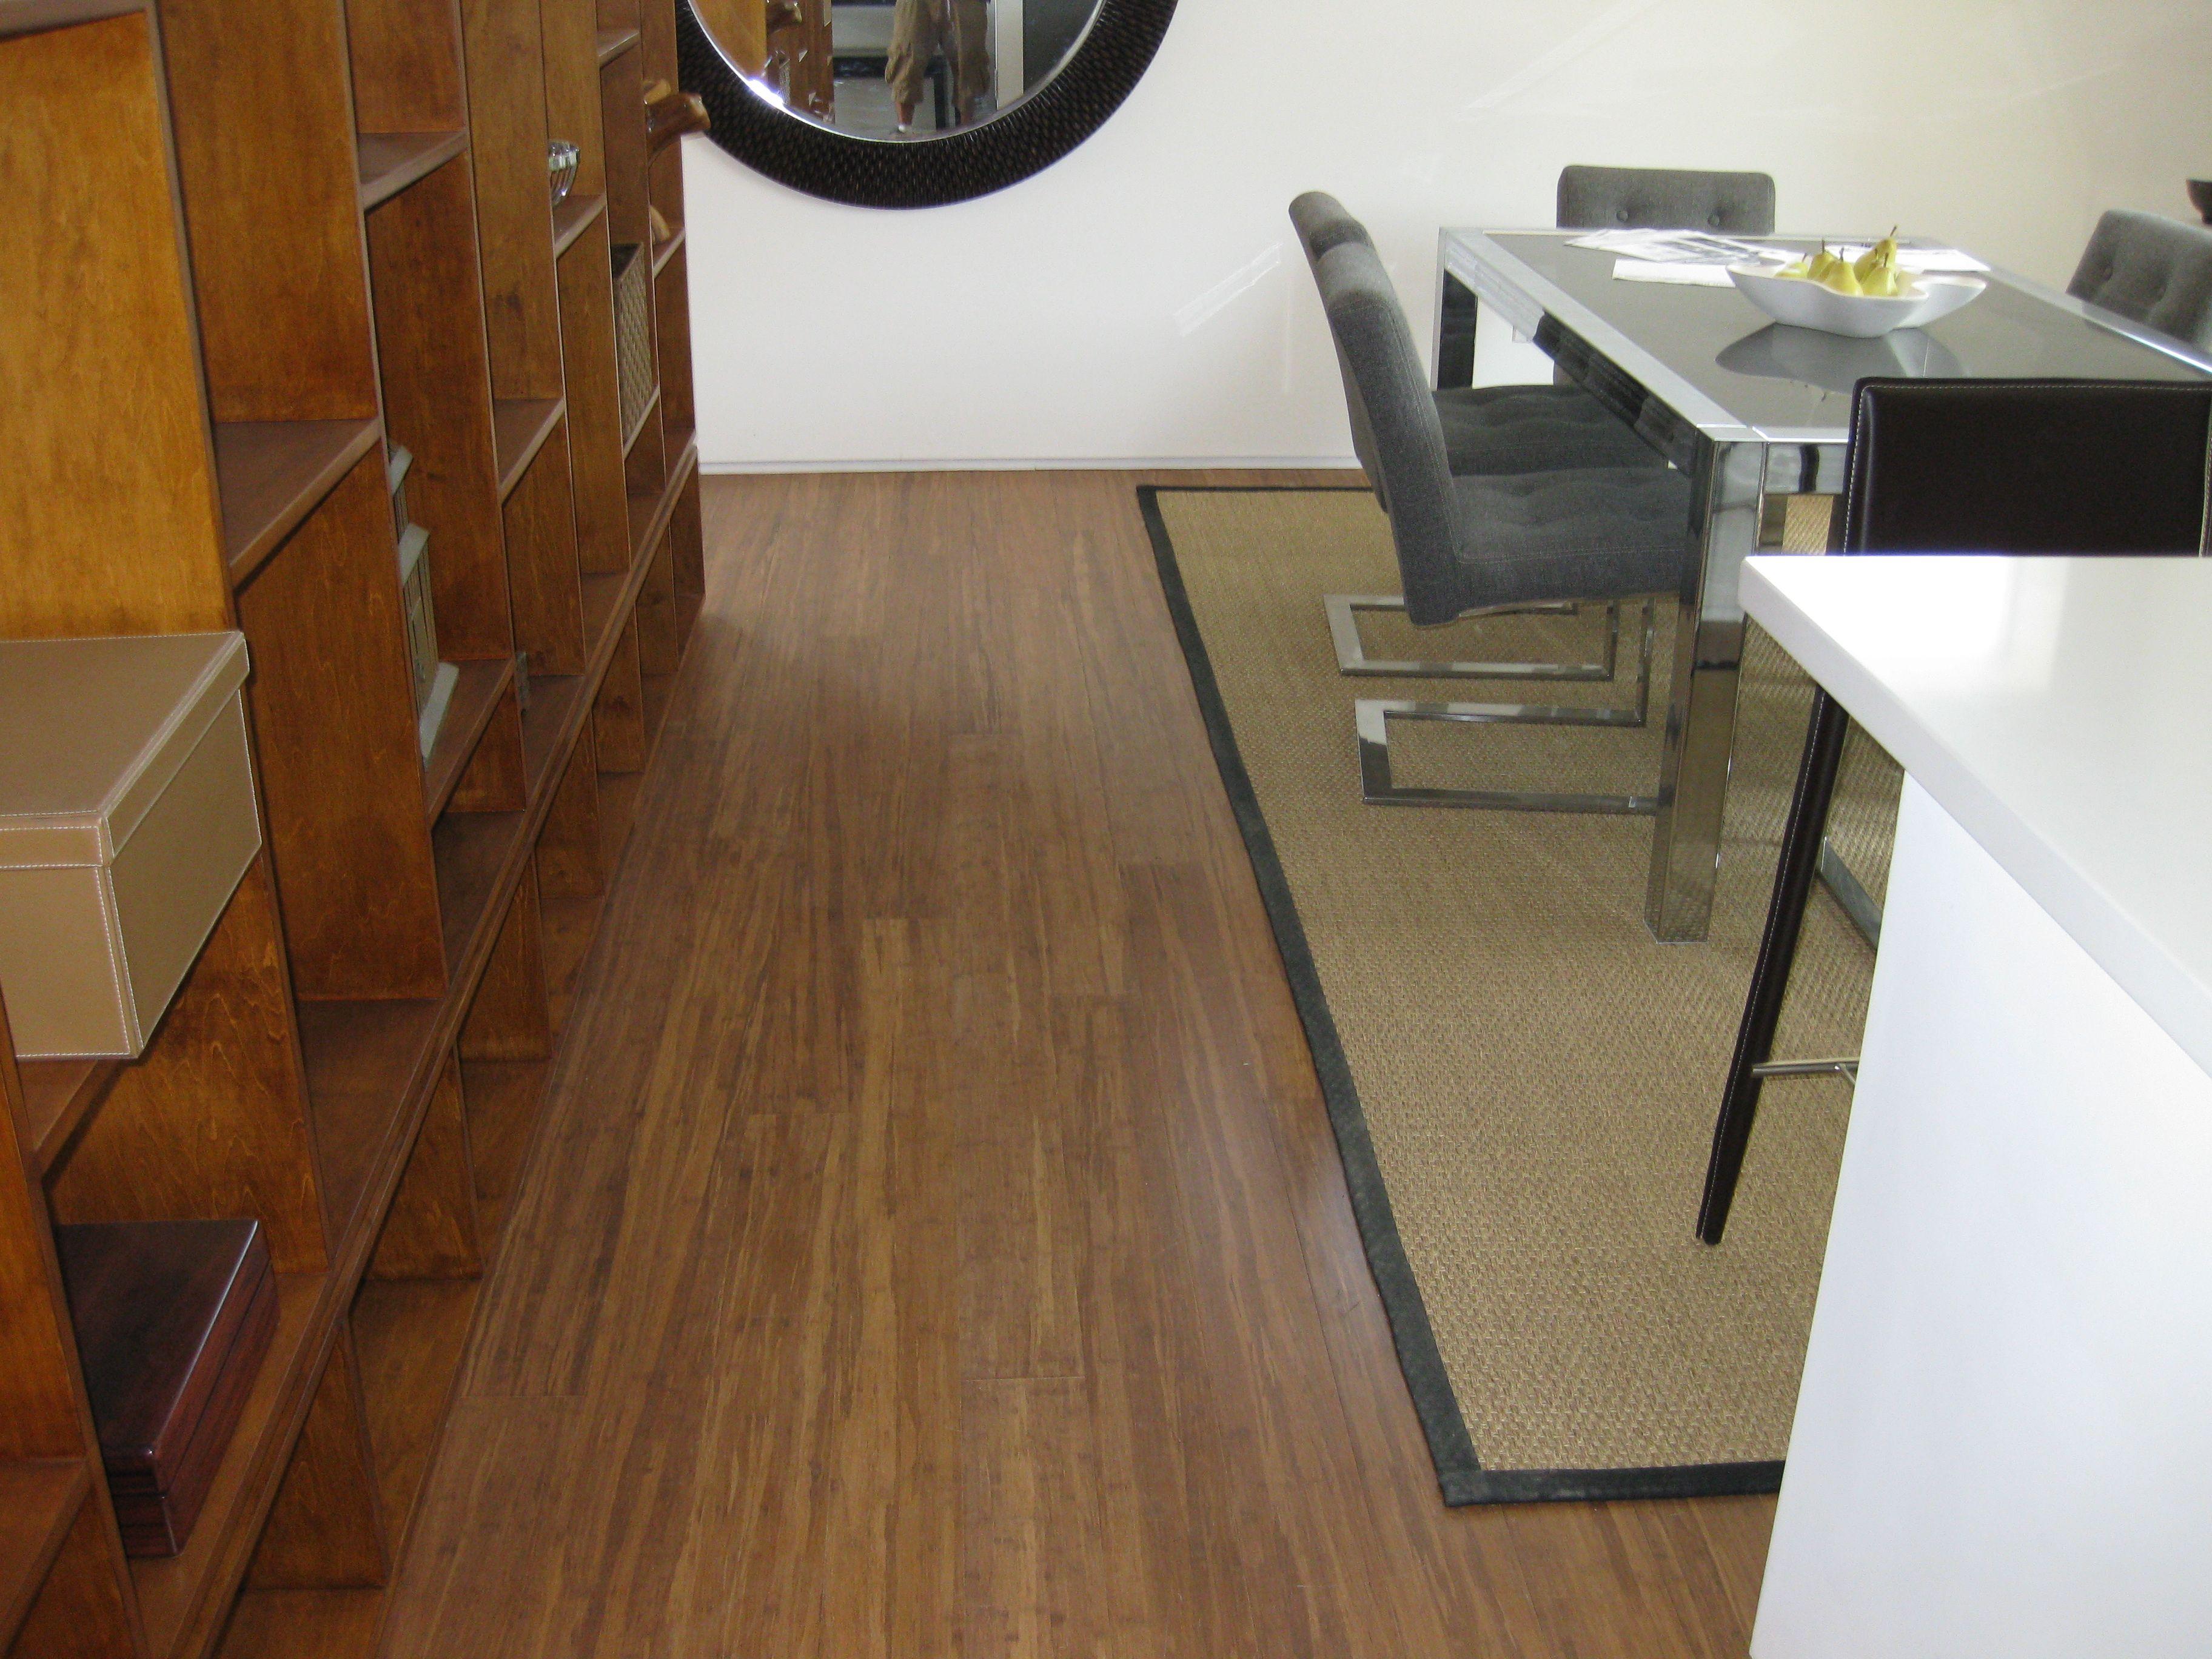 Pin By Sequoia Flooring On Wood Floors Flooring Flooring Contractor Best Flooring